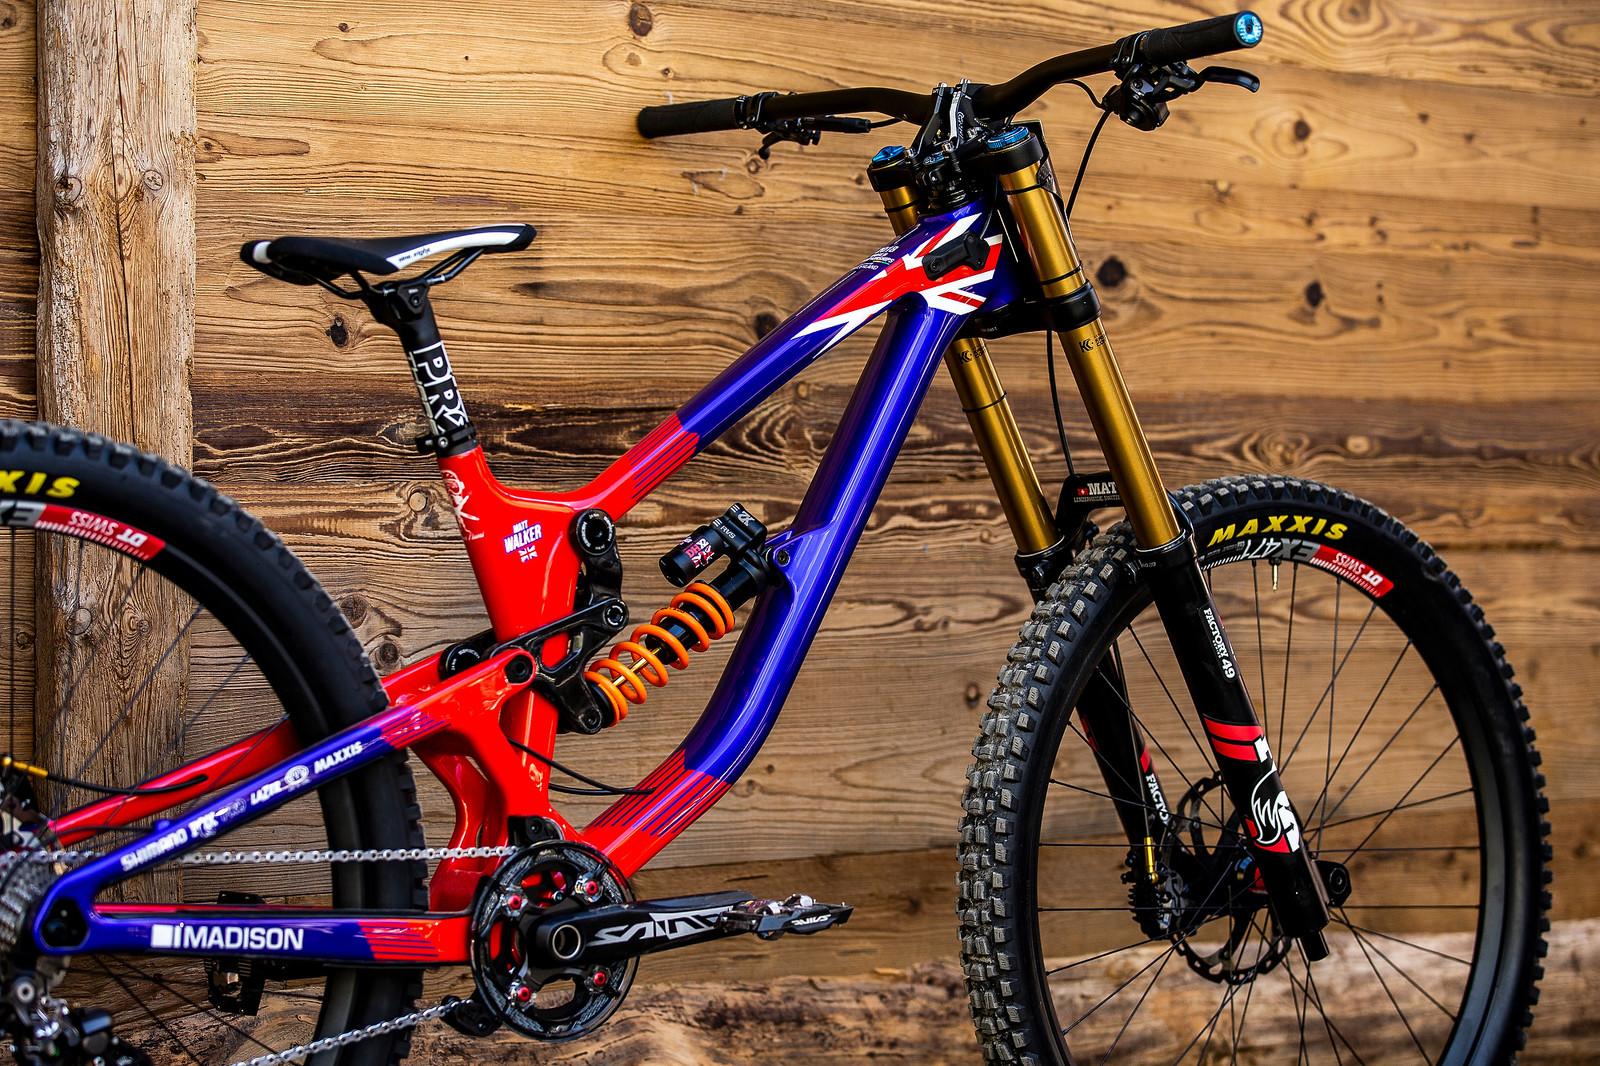 Clean Lines - WORLD CHAMPS BIKE - Matt Walker's Saracen Myst - Mountain Biking Pictures - Vital MTB